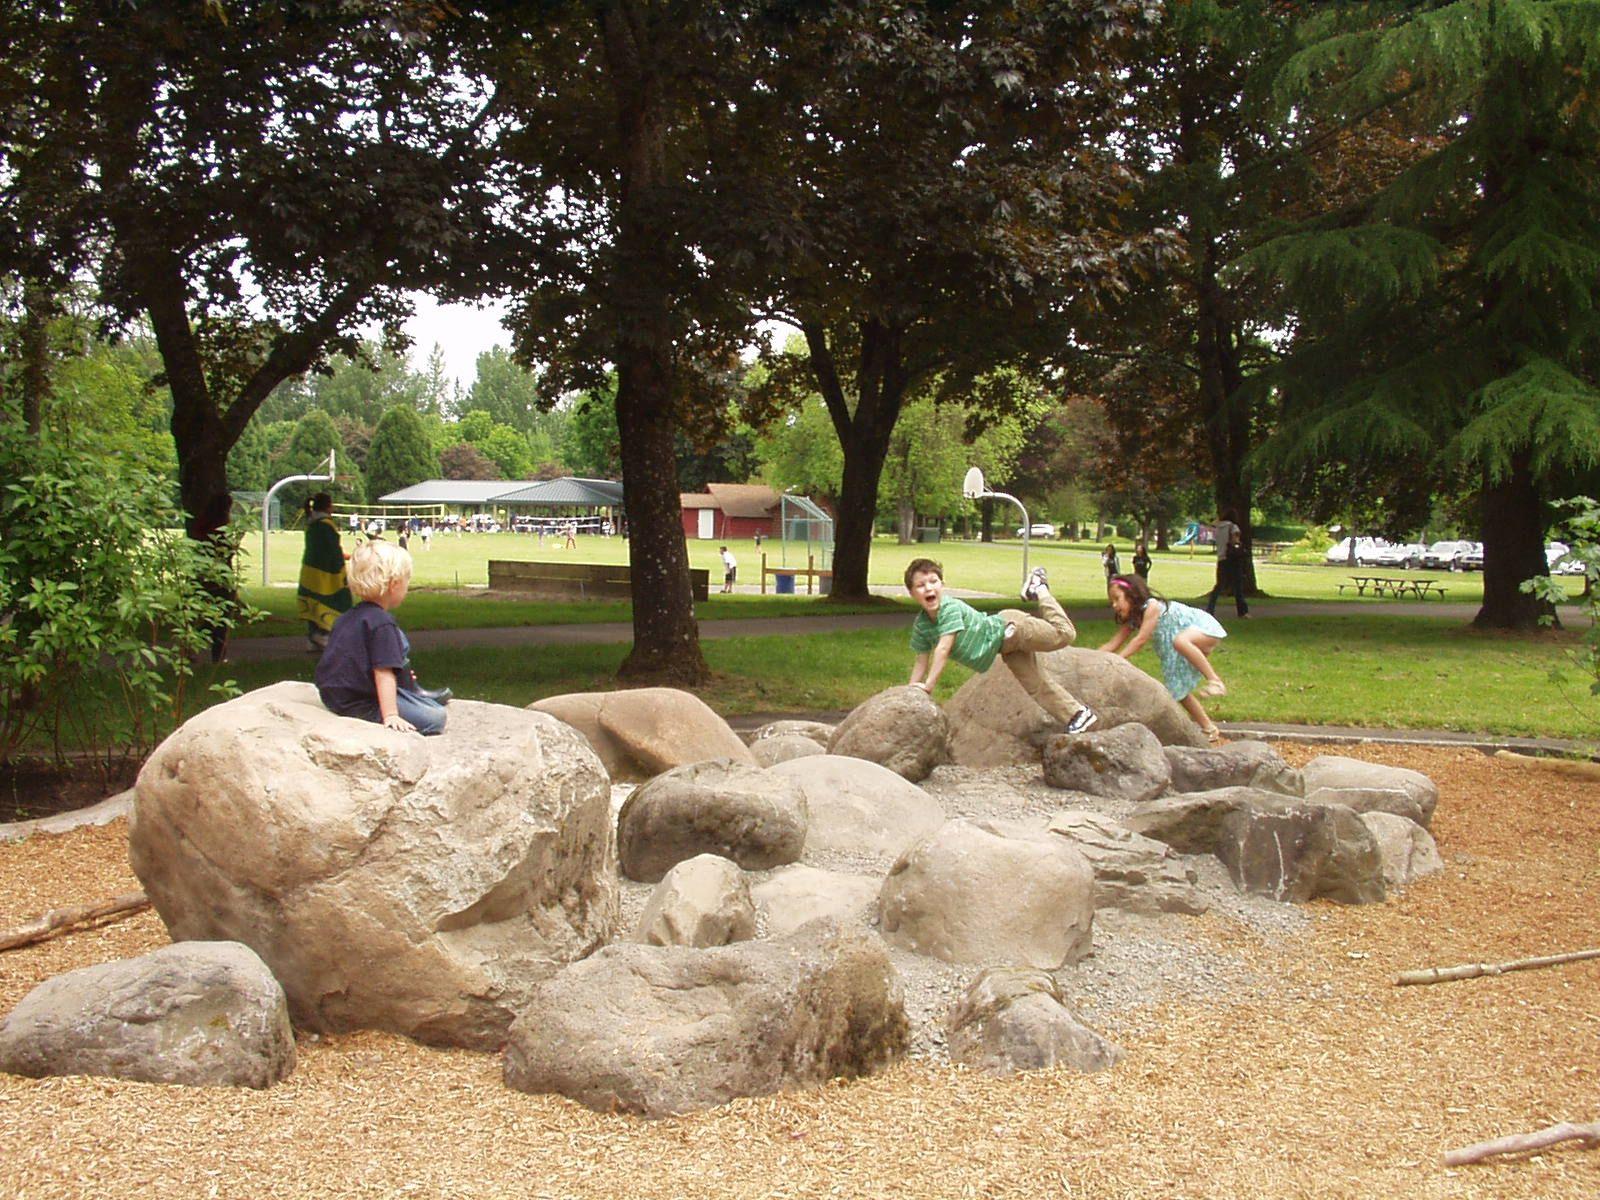 great boulder garden playgrounds pinterest playground gardens and natural playgrounds. Black Bedroom Furniture Sets. Home Design Ideas